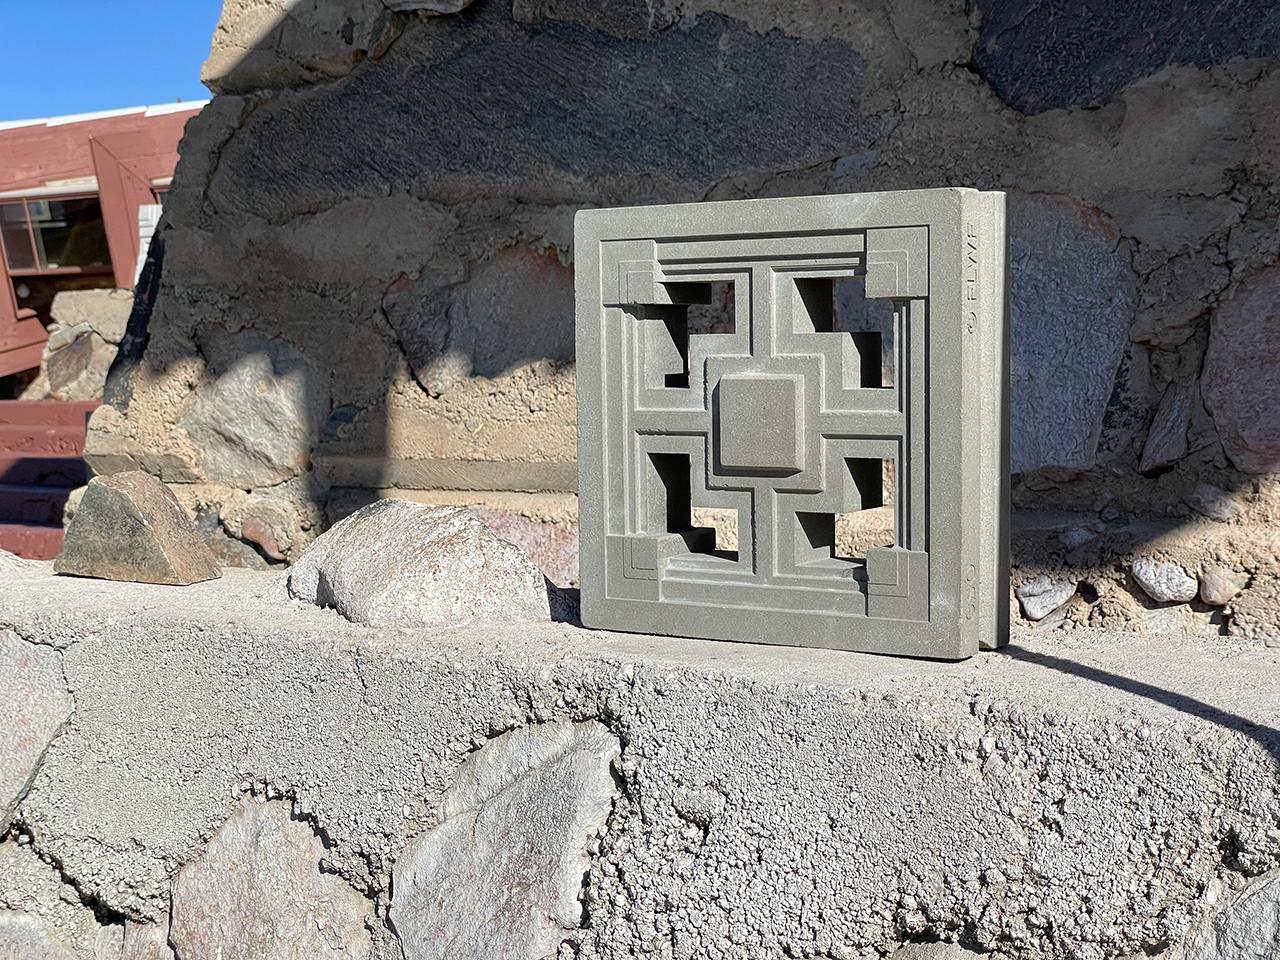 Storer textile block sitting on cement ledge